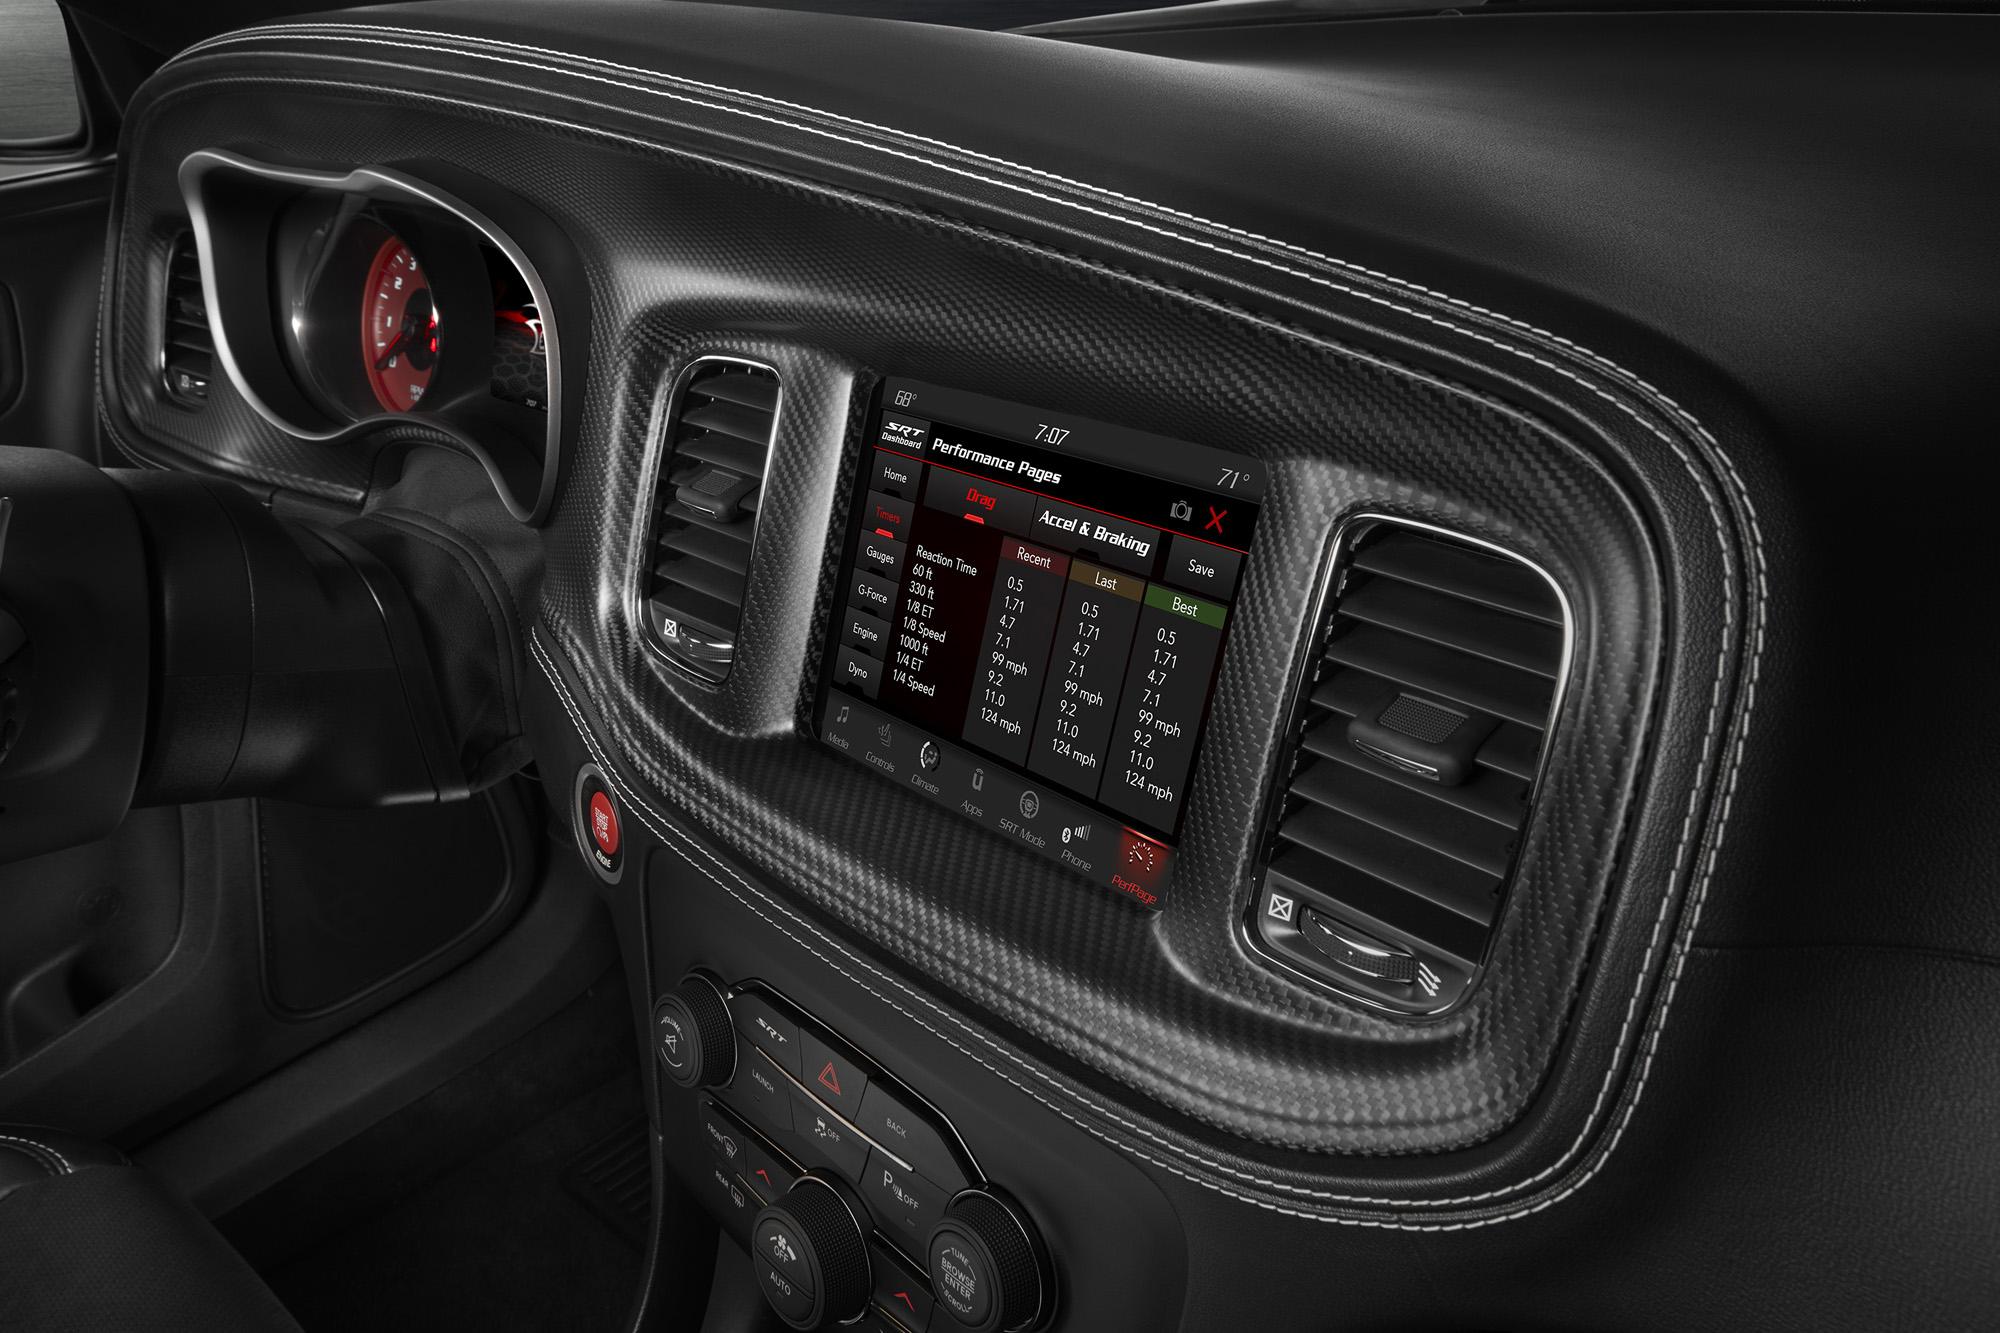 Standard SRT Performance Pages in the 2020 Dodge Charger SRT Hel